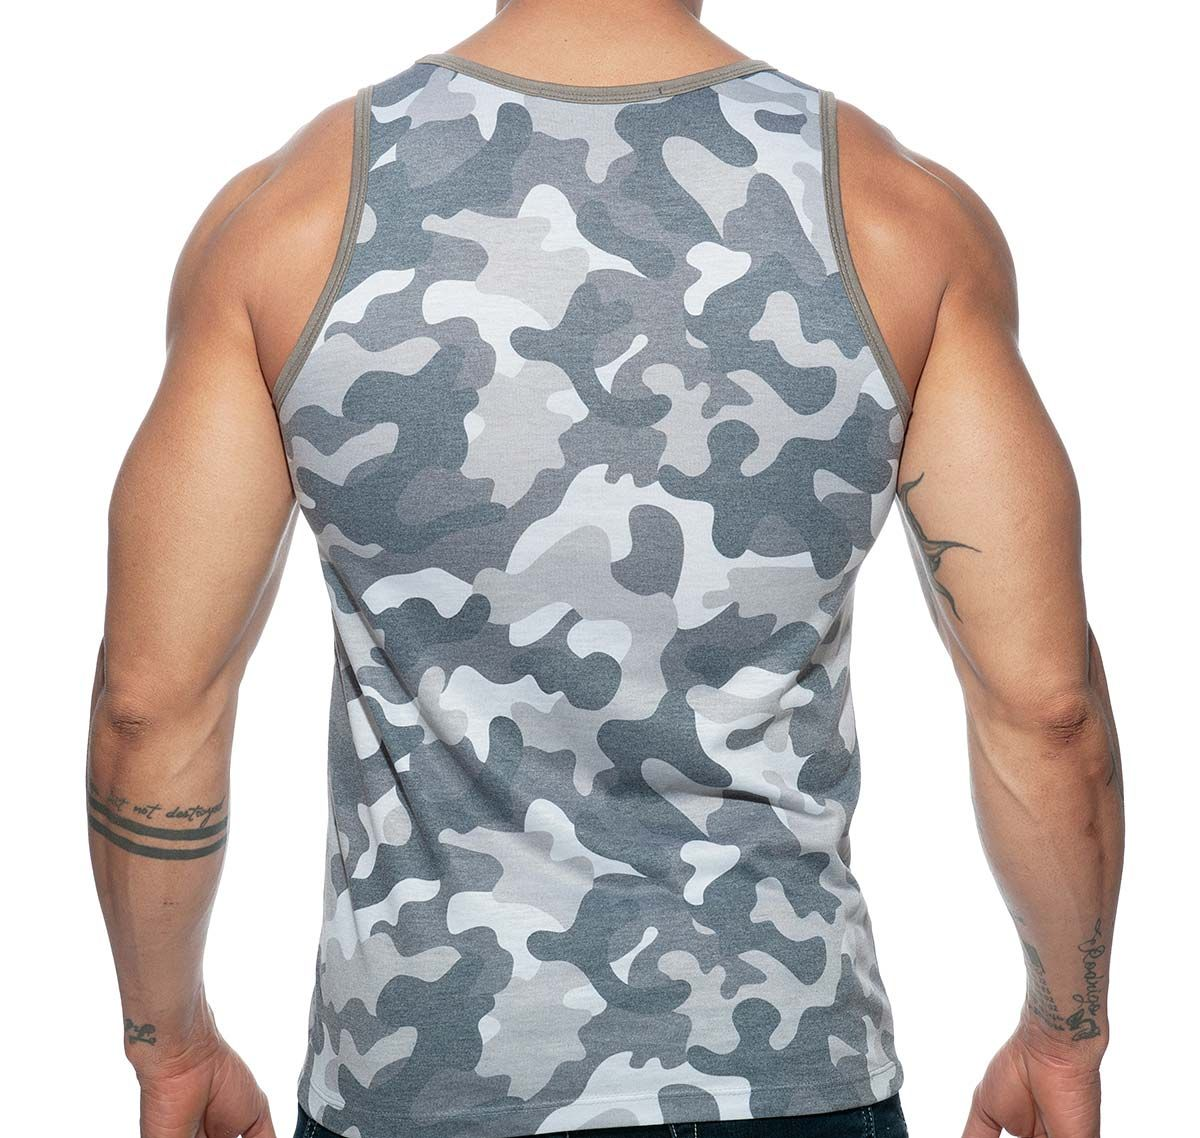 Addicted Sportshirt ADDICTED WASHED CAMO TANK TOP AD801, grau